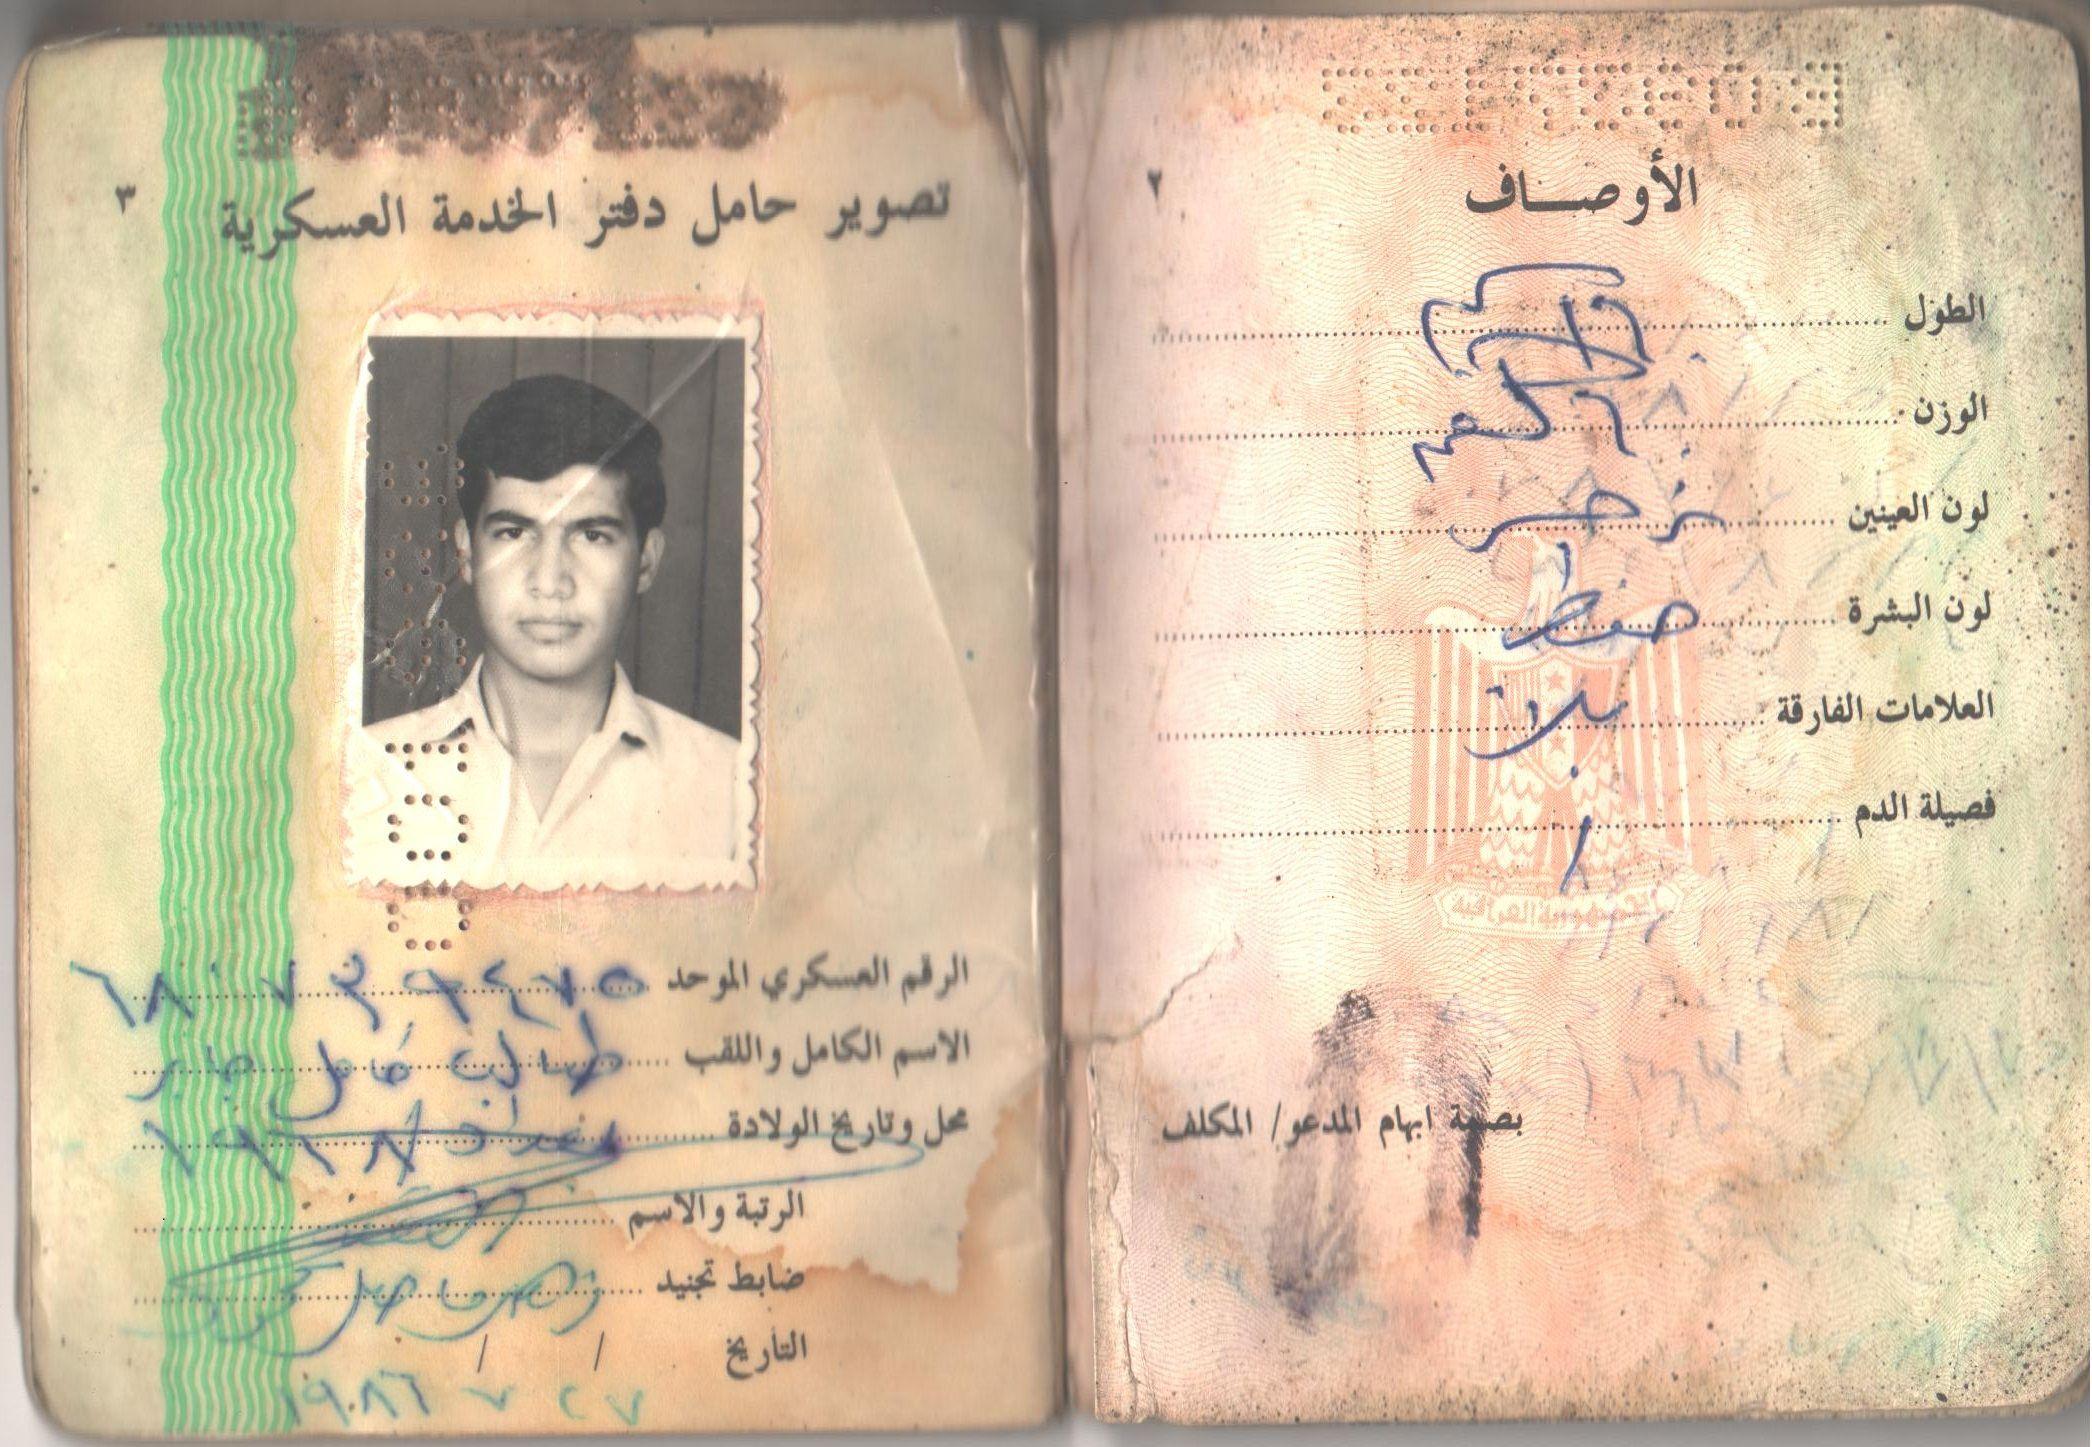 Pin By سيد طالب العلوي On اوراق عراقية Book Cover Books Cover